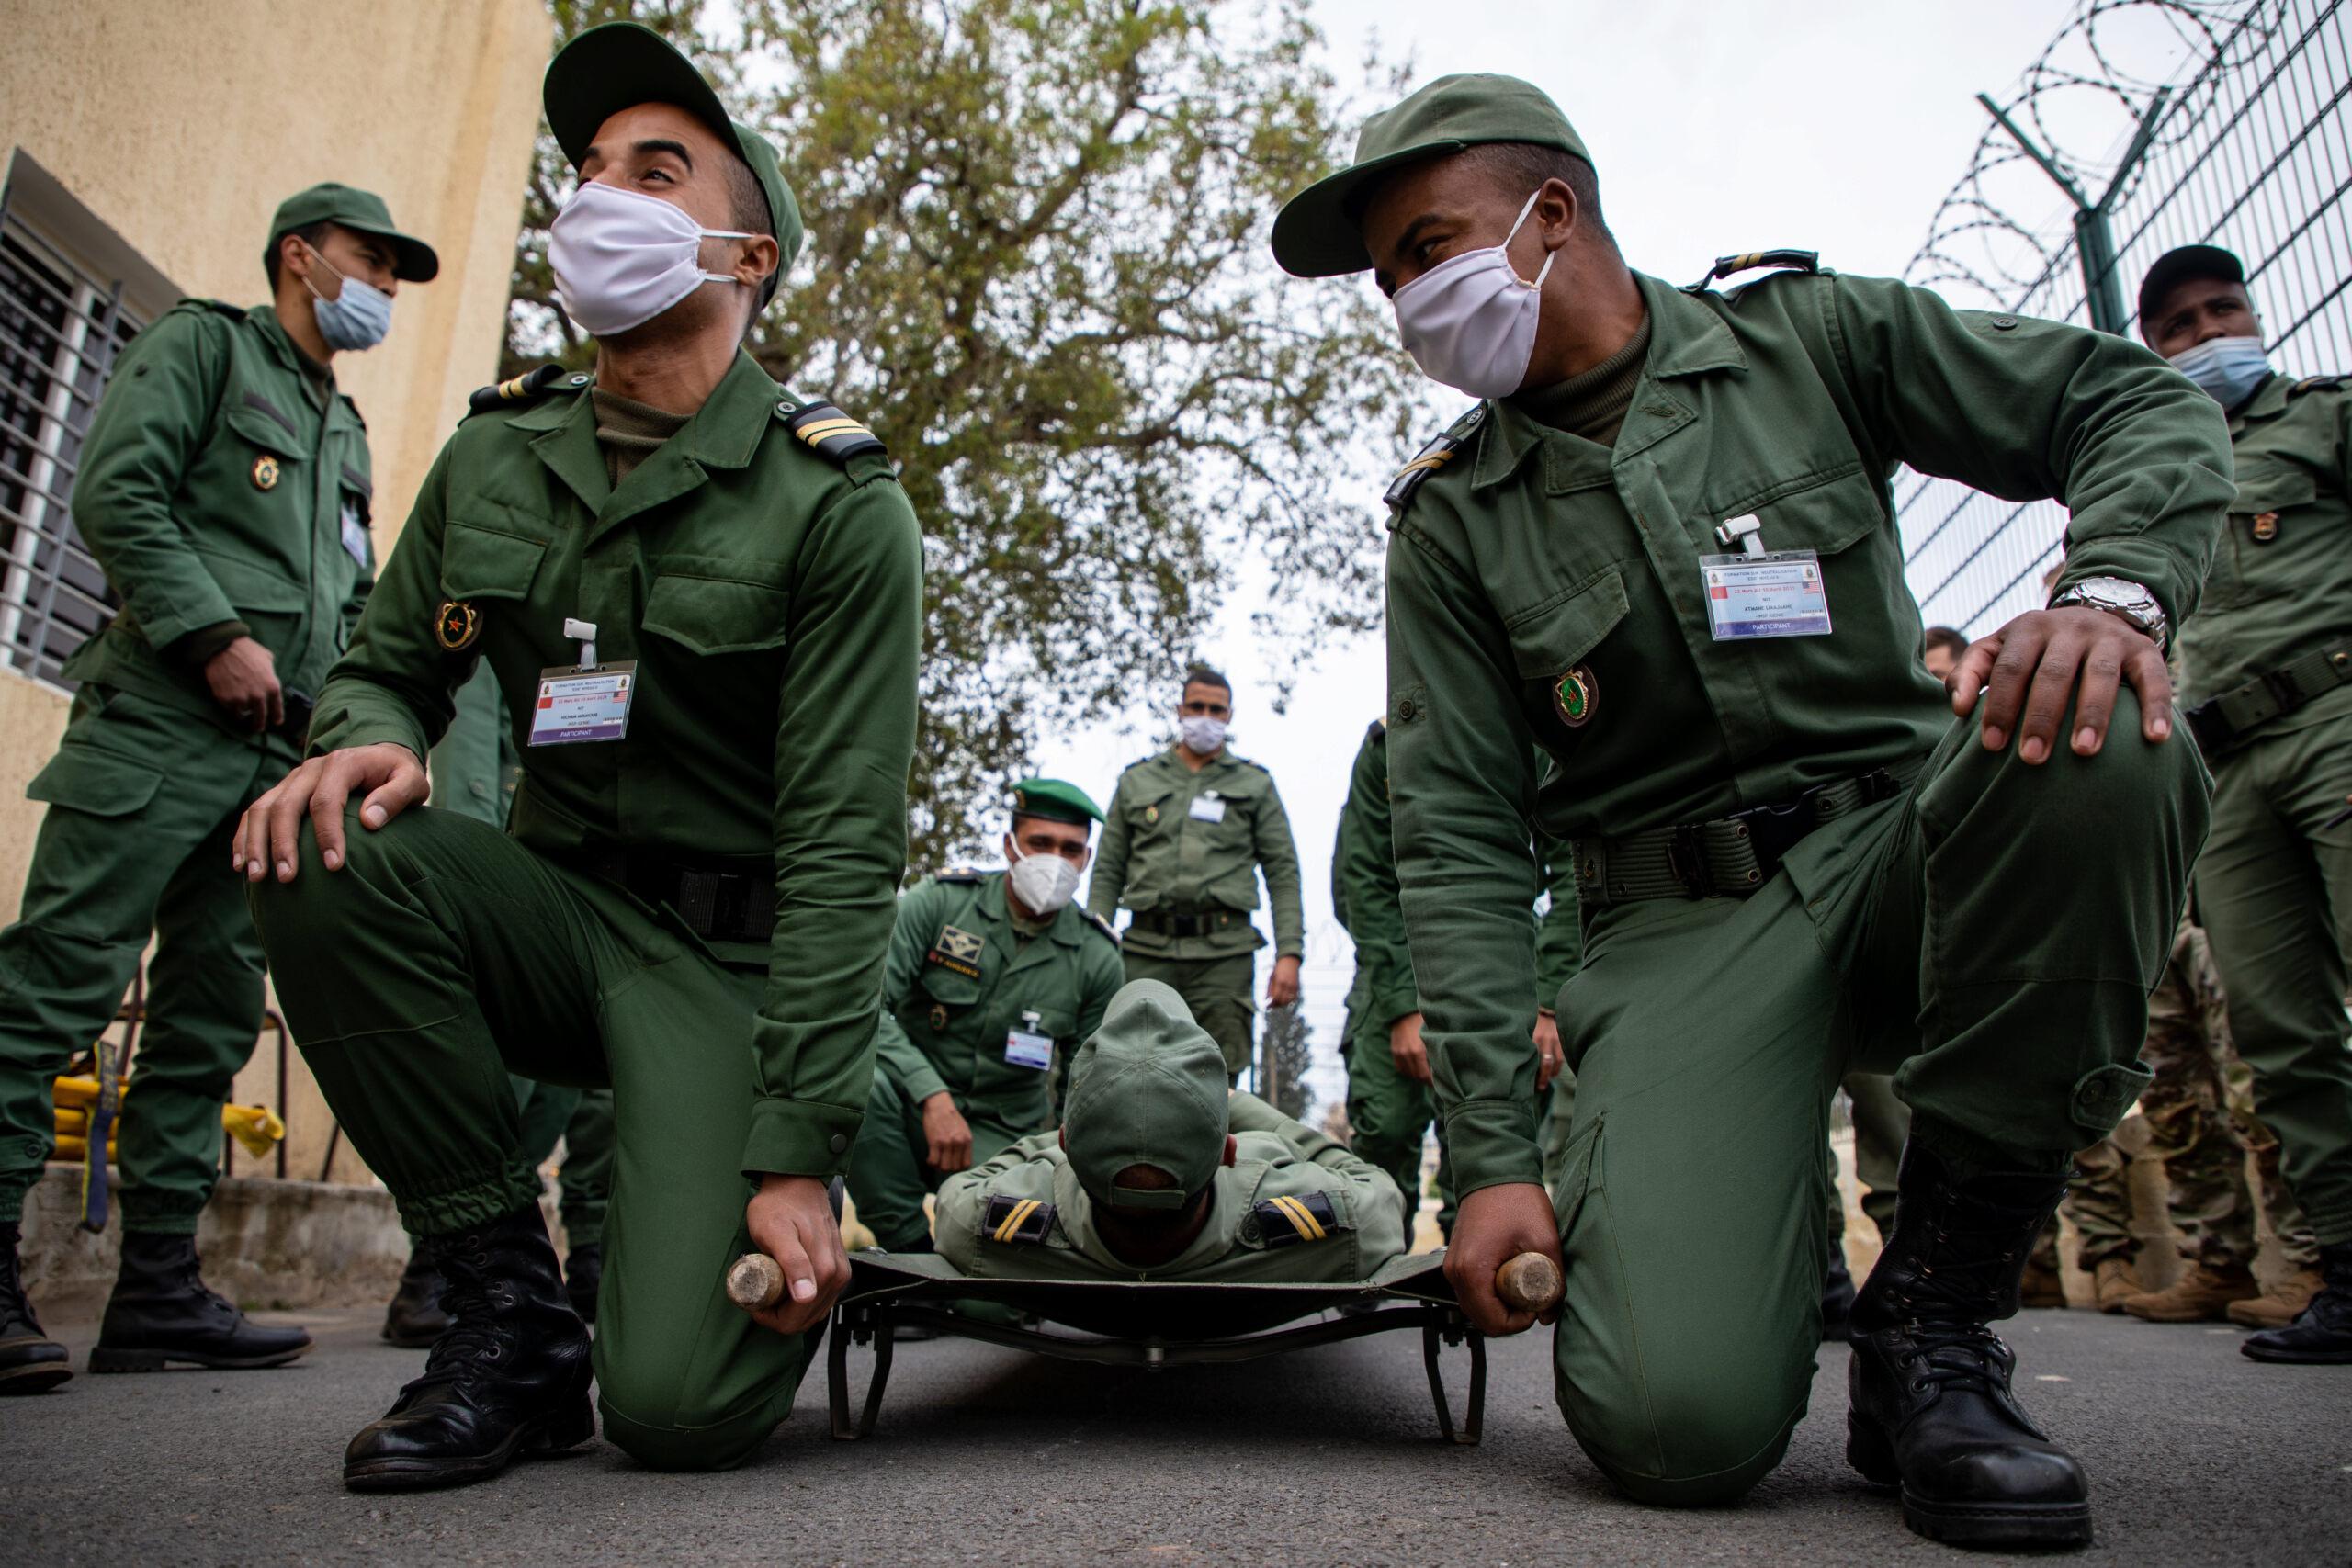 Cooperation militaire avec les USA - Page 9 21032614